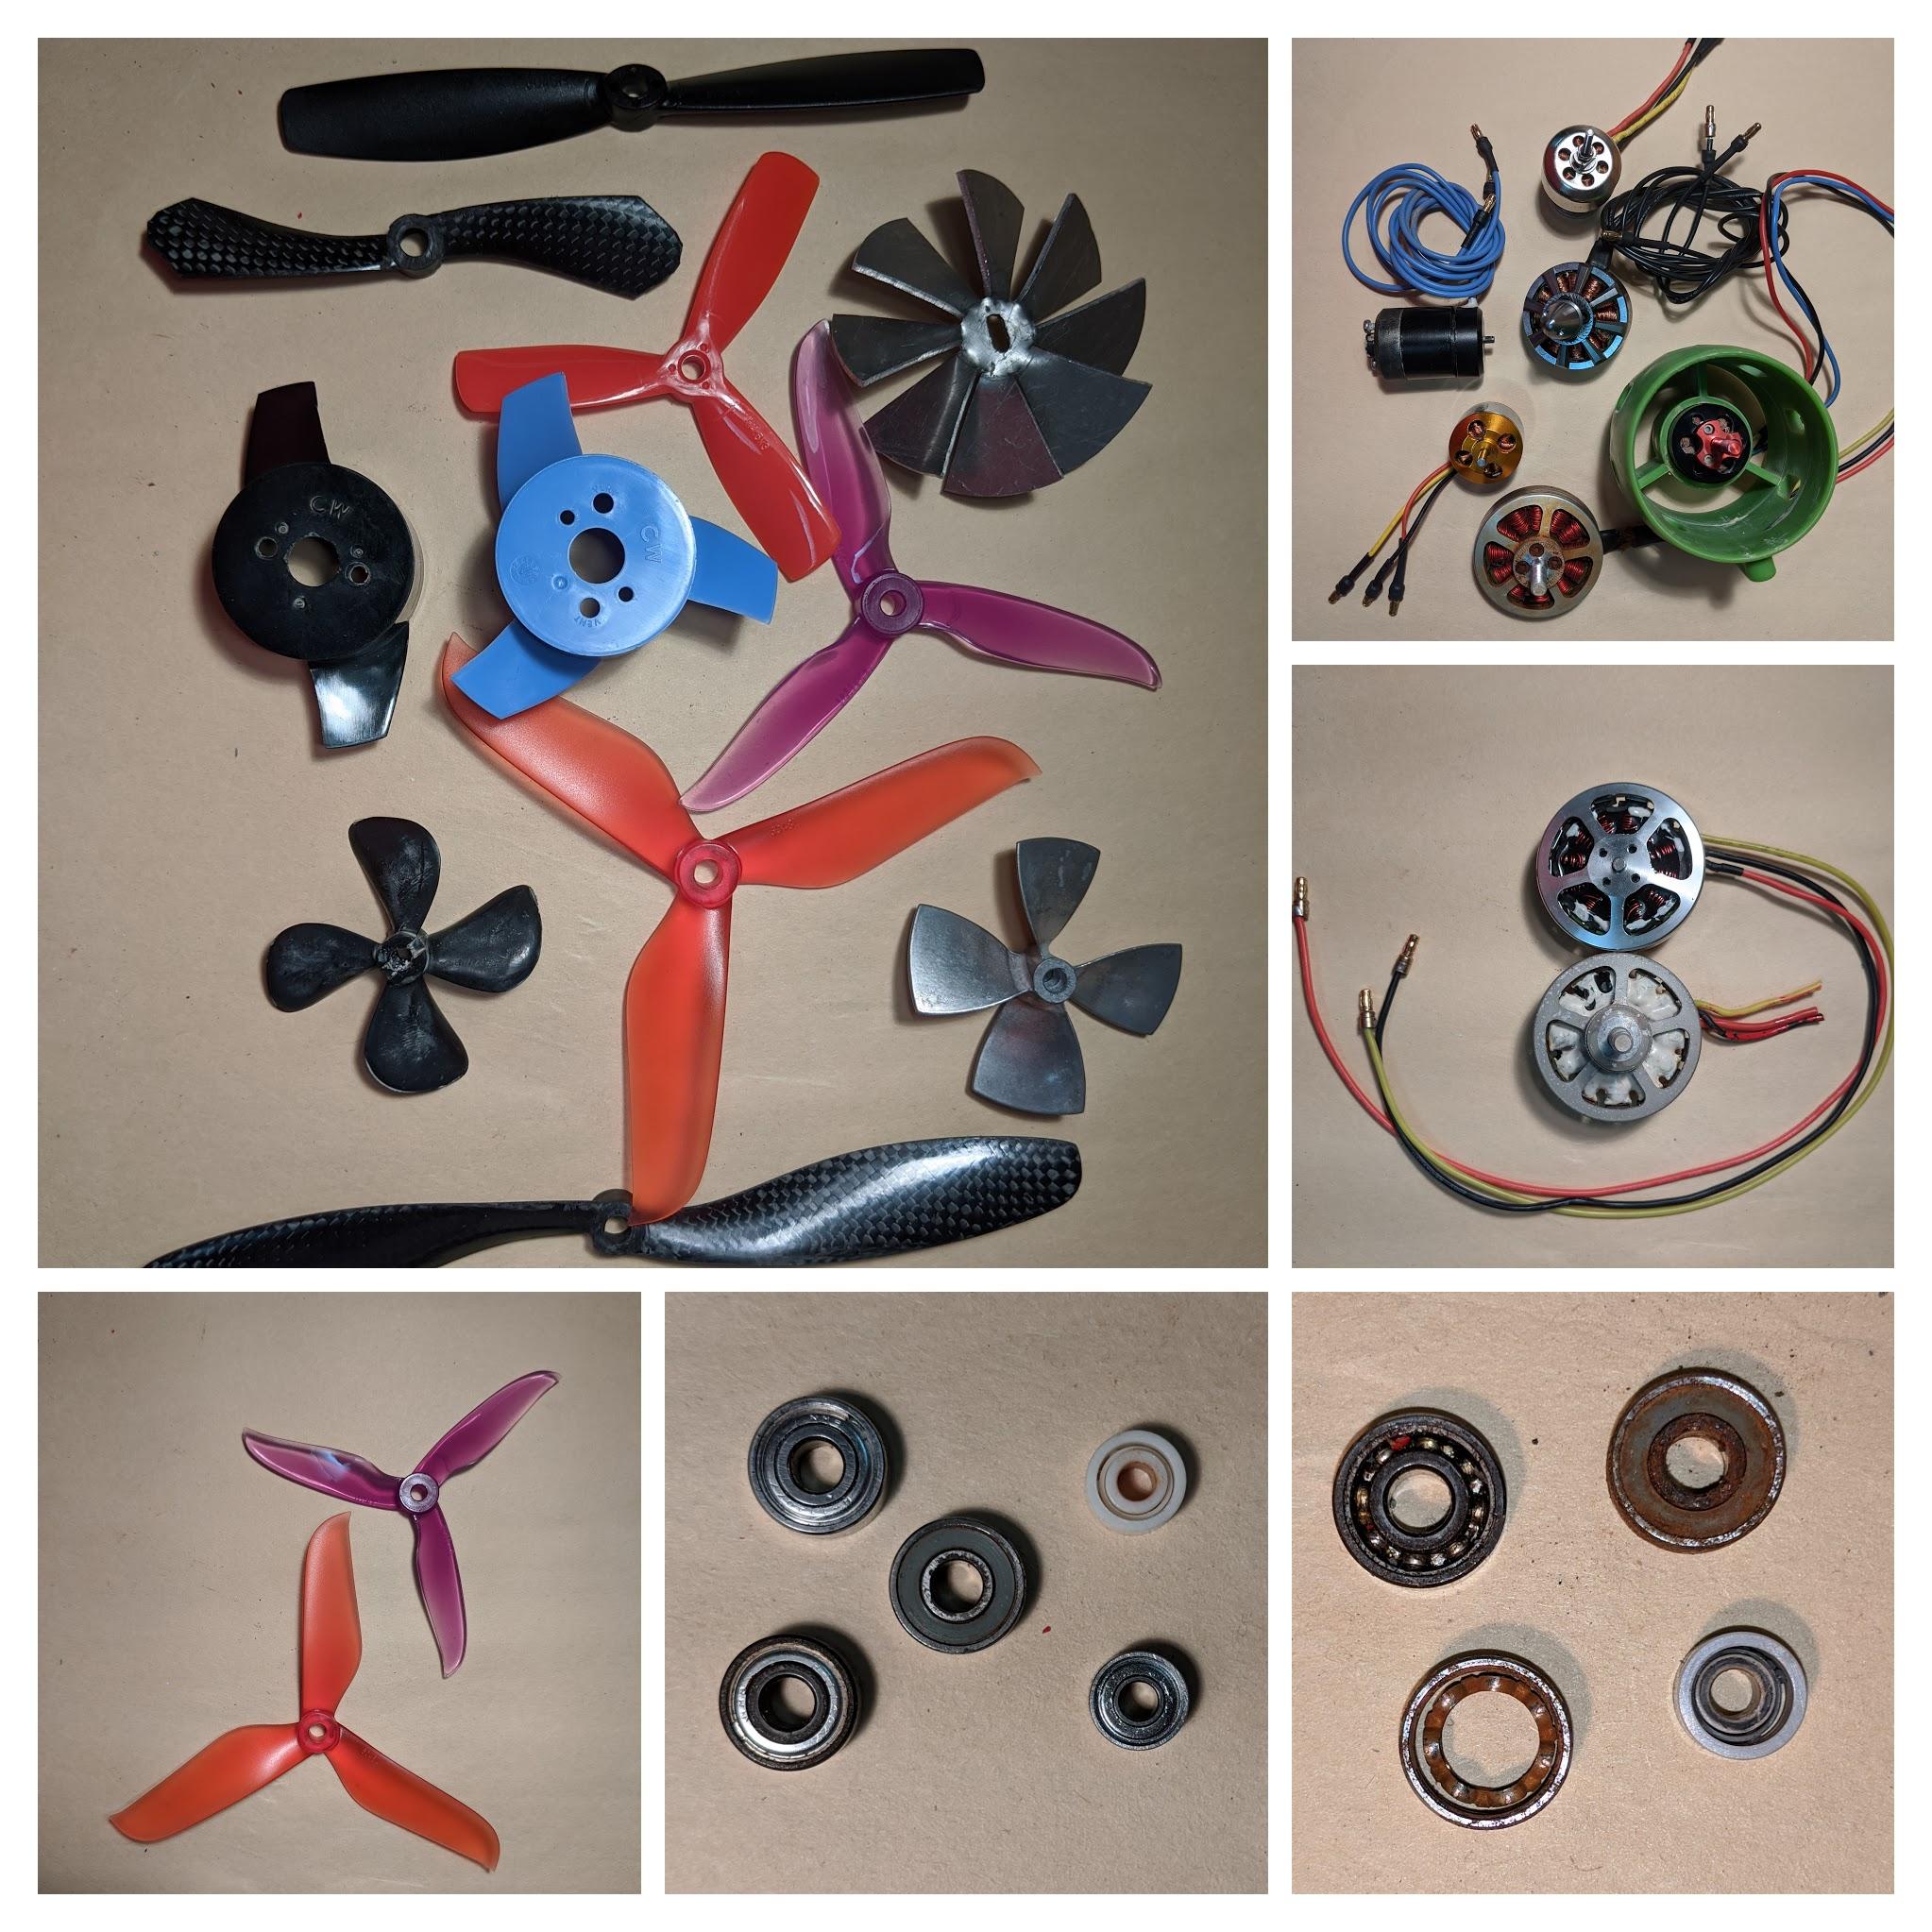 Propulsion components